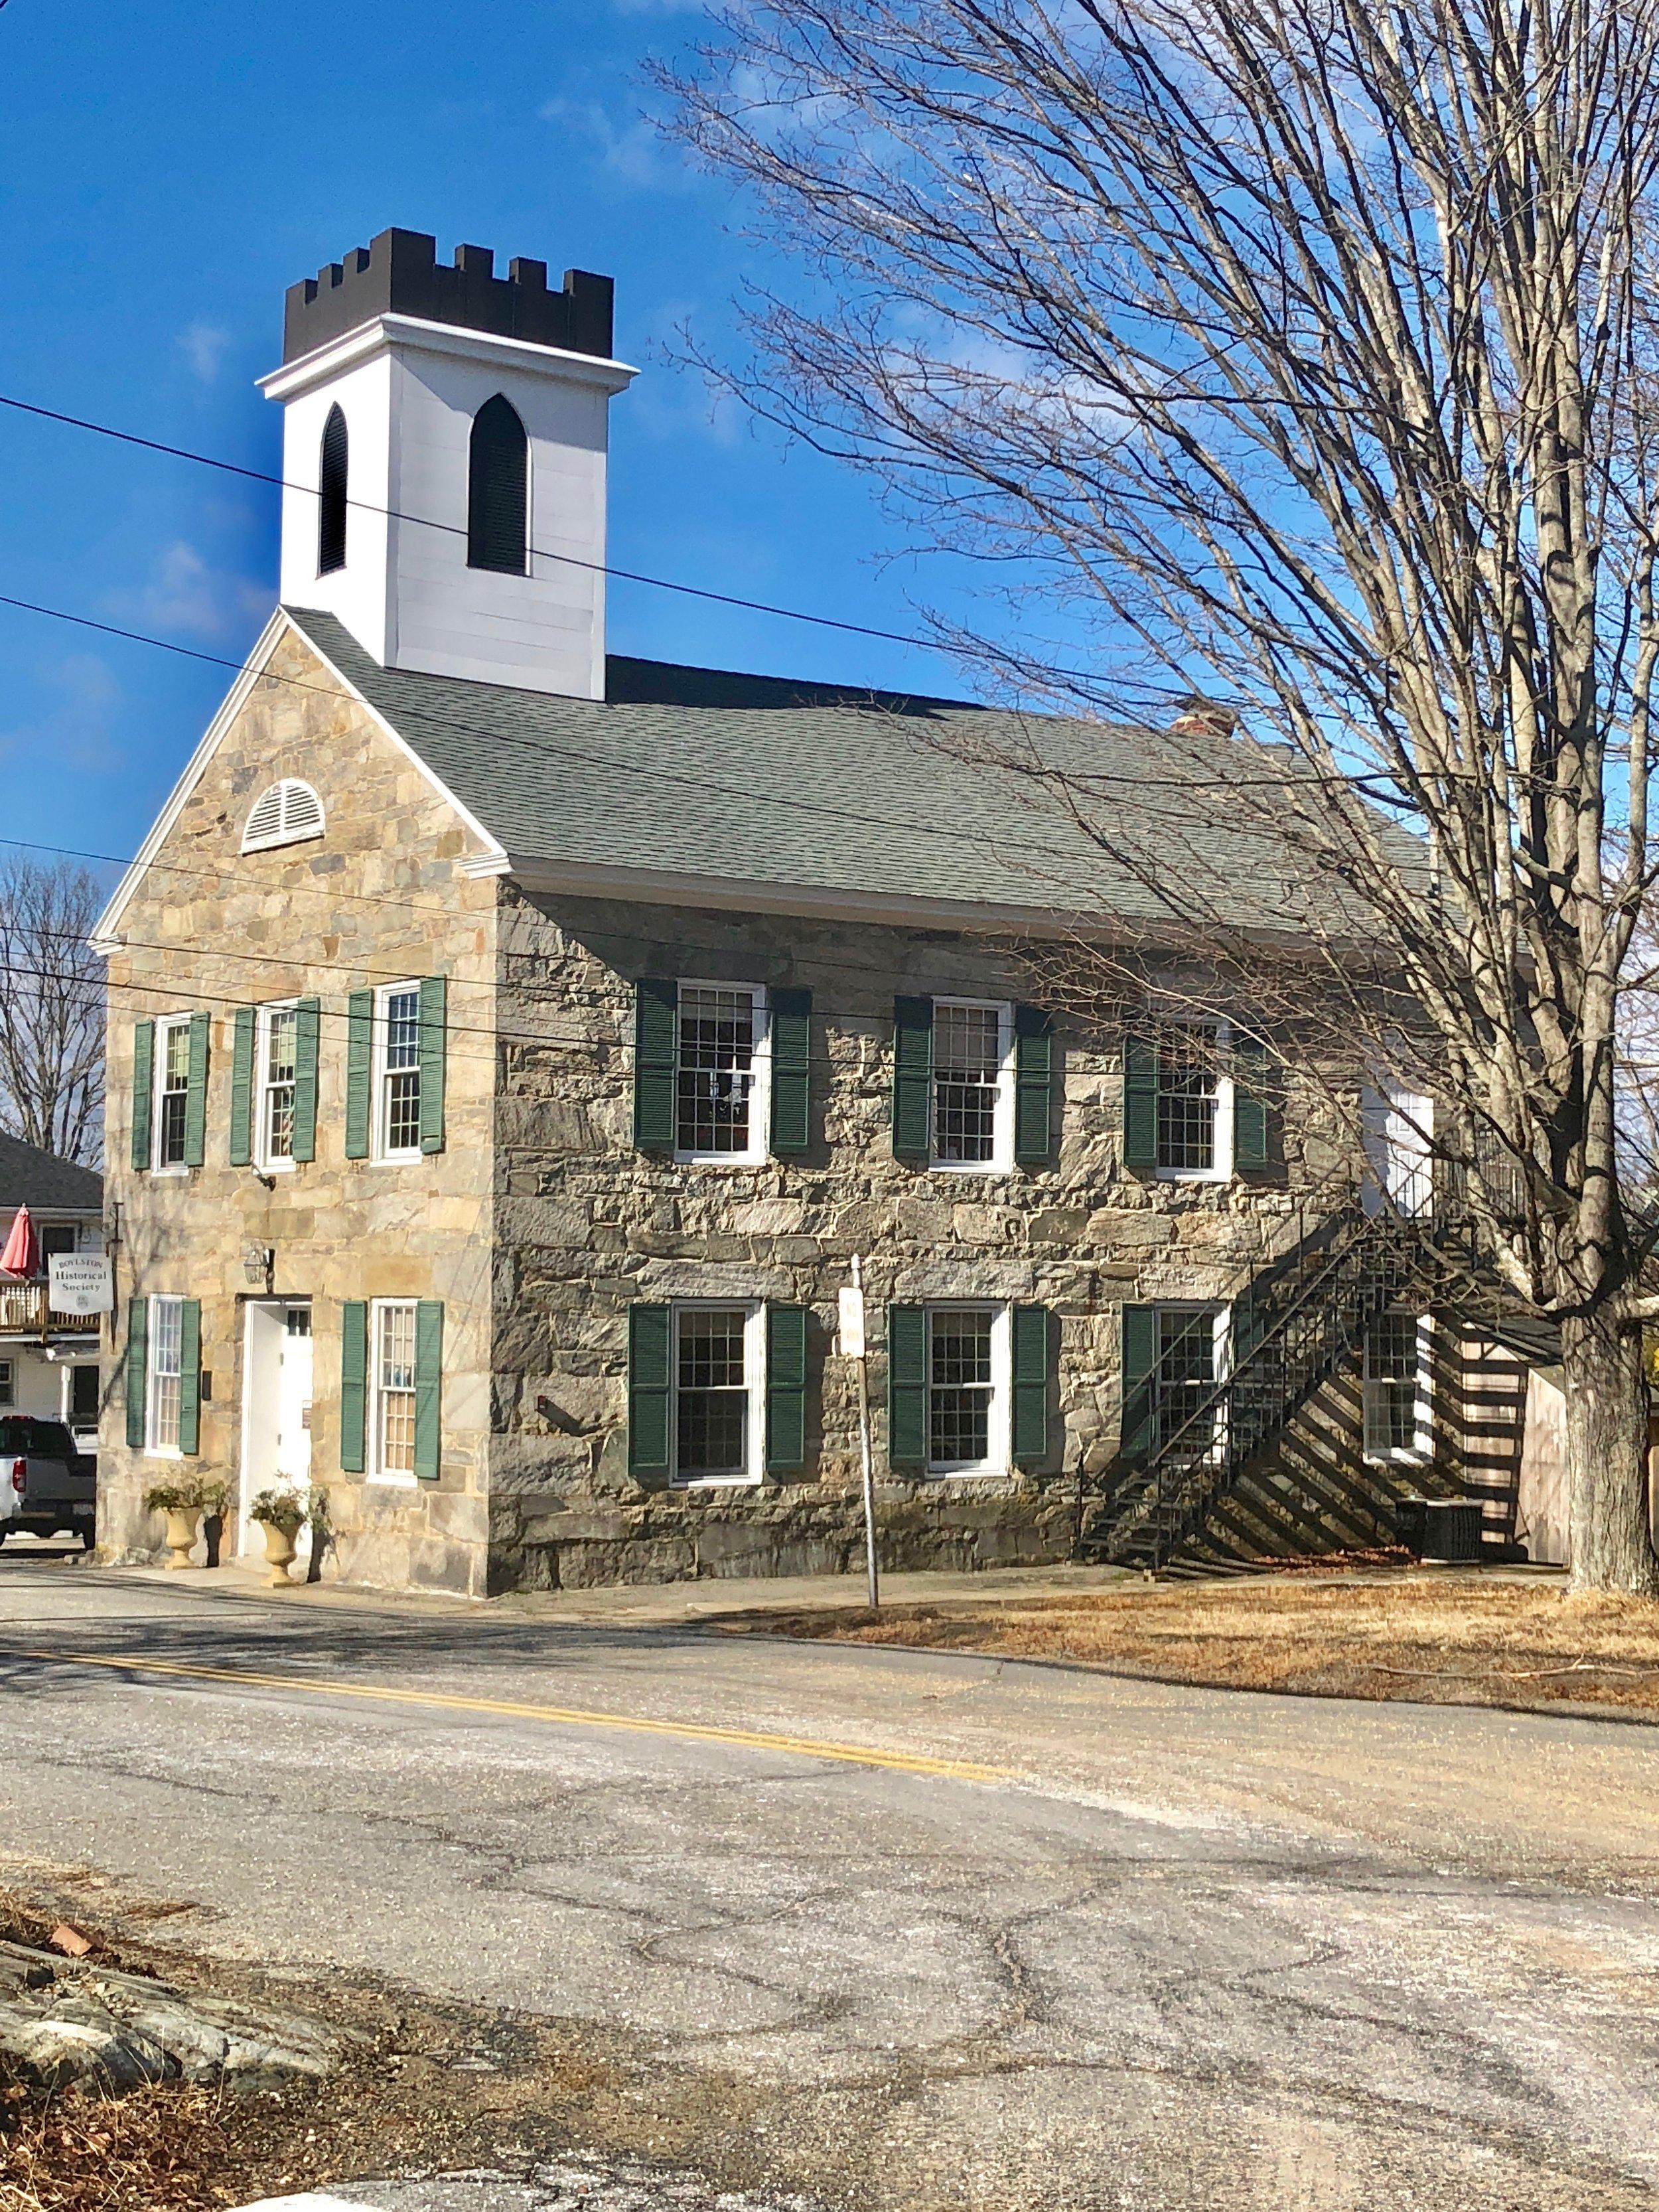 Bolton Massachusetts historic stone building New England